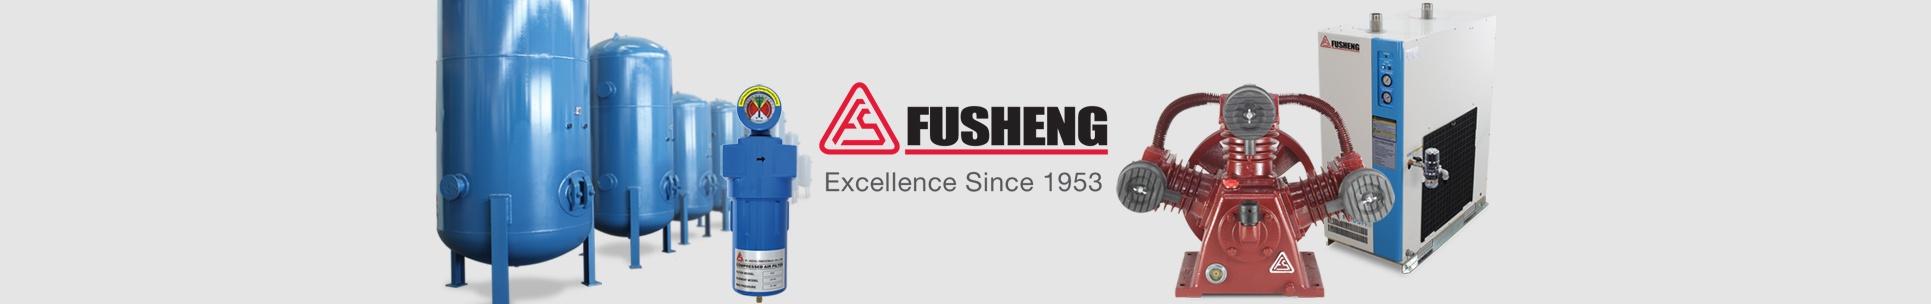 Glenco Banner Image-Fusheng